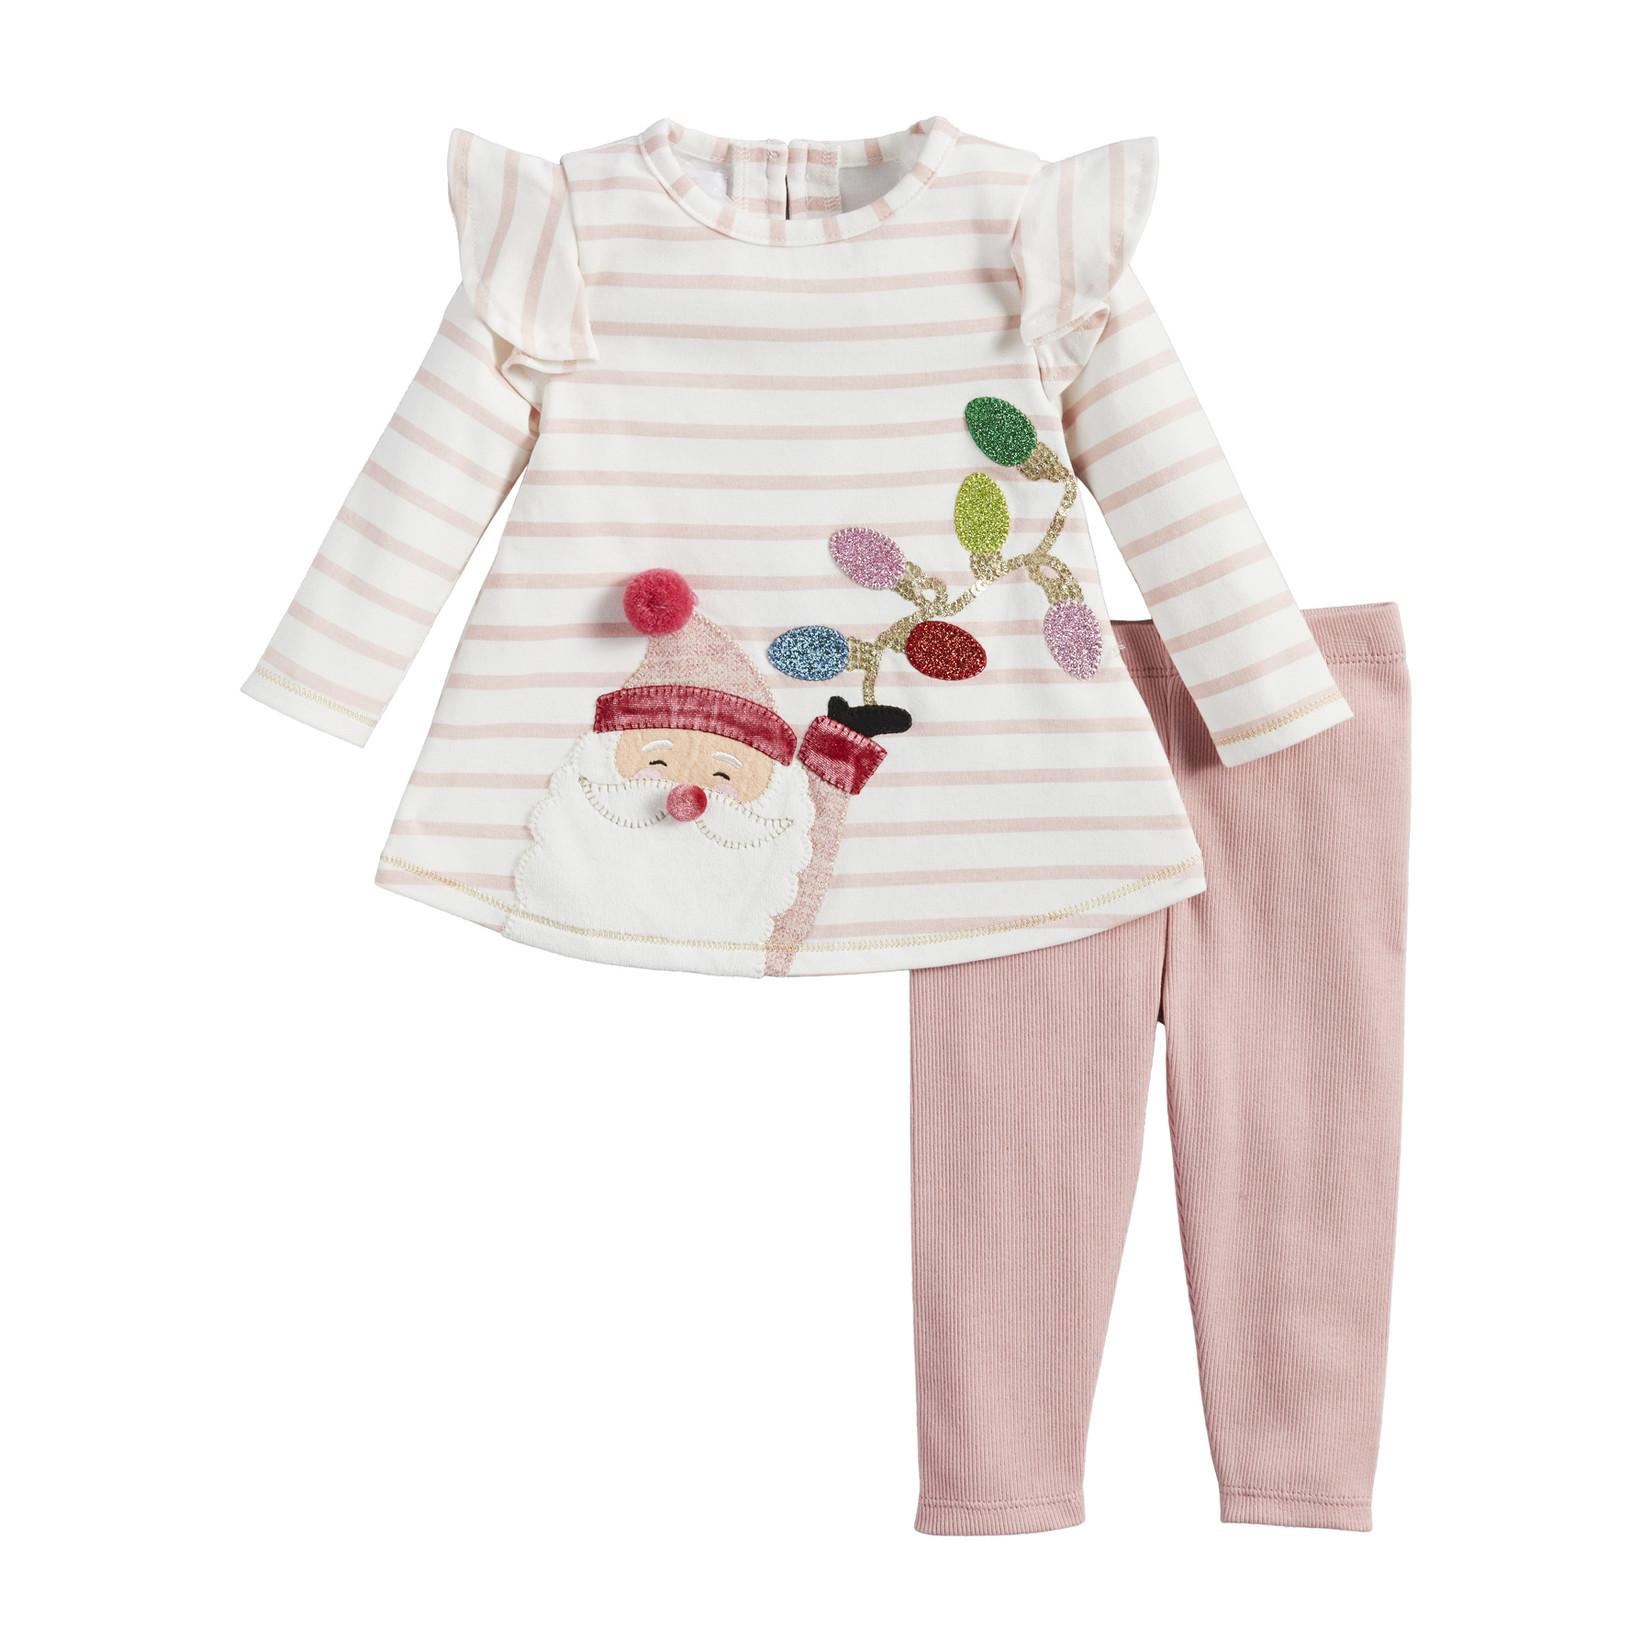 Mudpie Pink Santa Tunic and Leggings Set